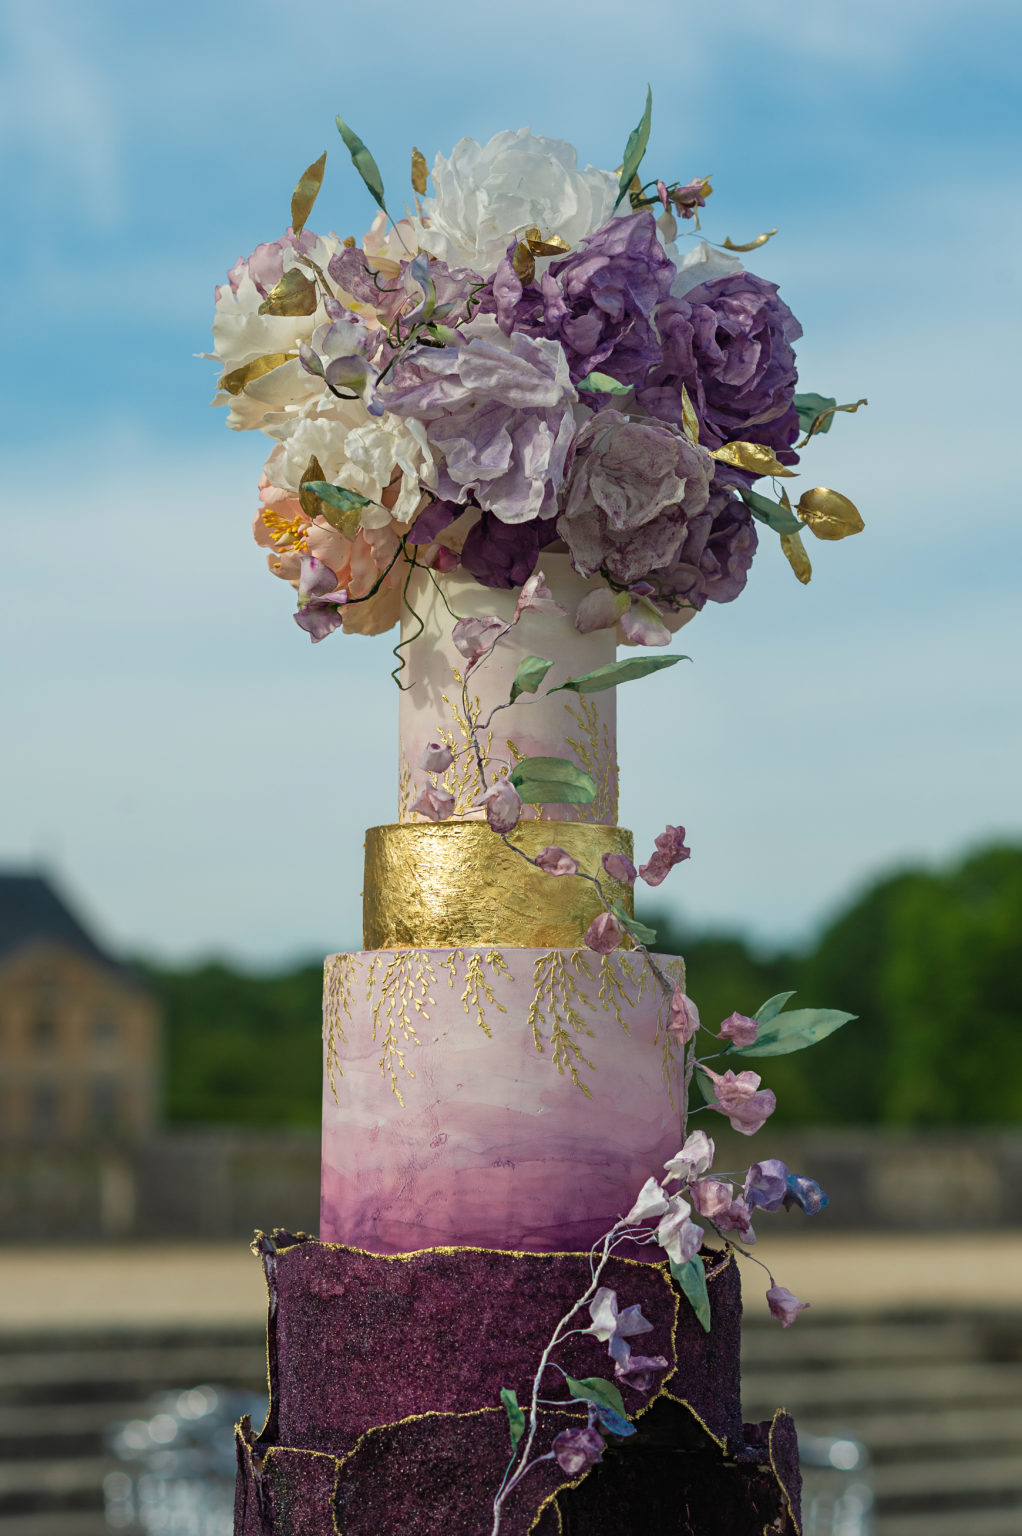 Luxury Wedding Cake at Château de Vaux le Vicomte, Bouchra Sugar Designer